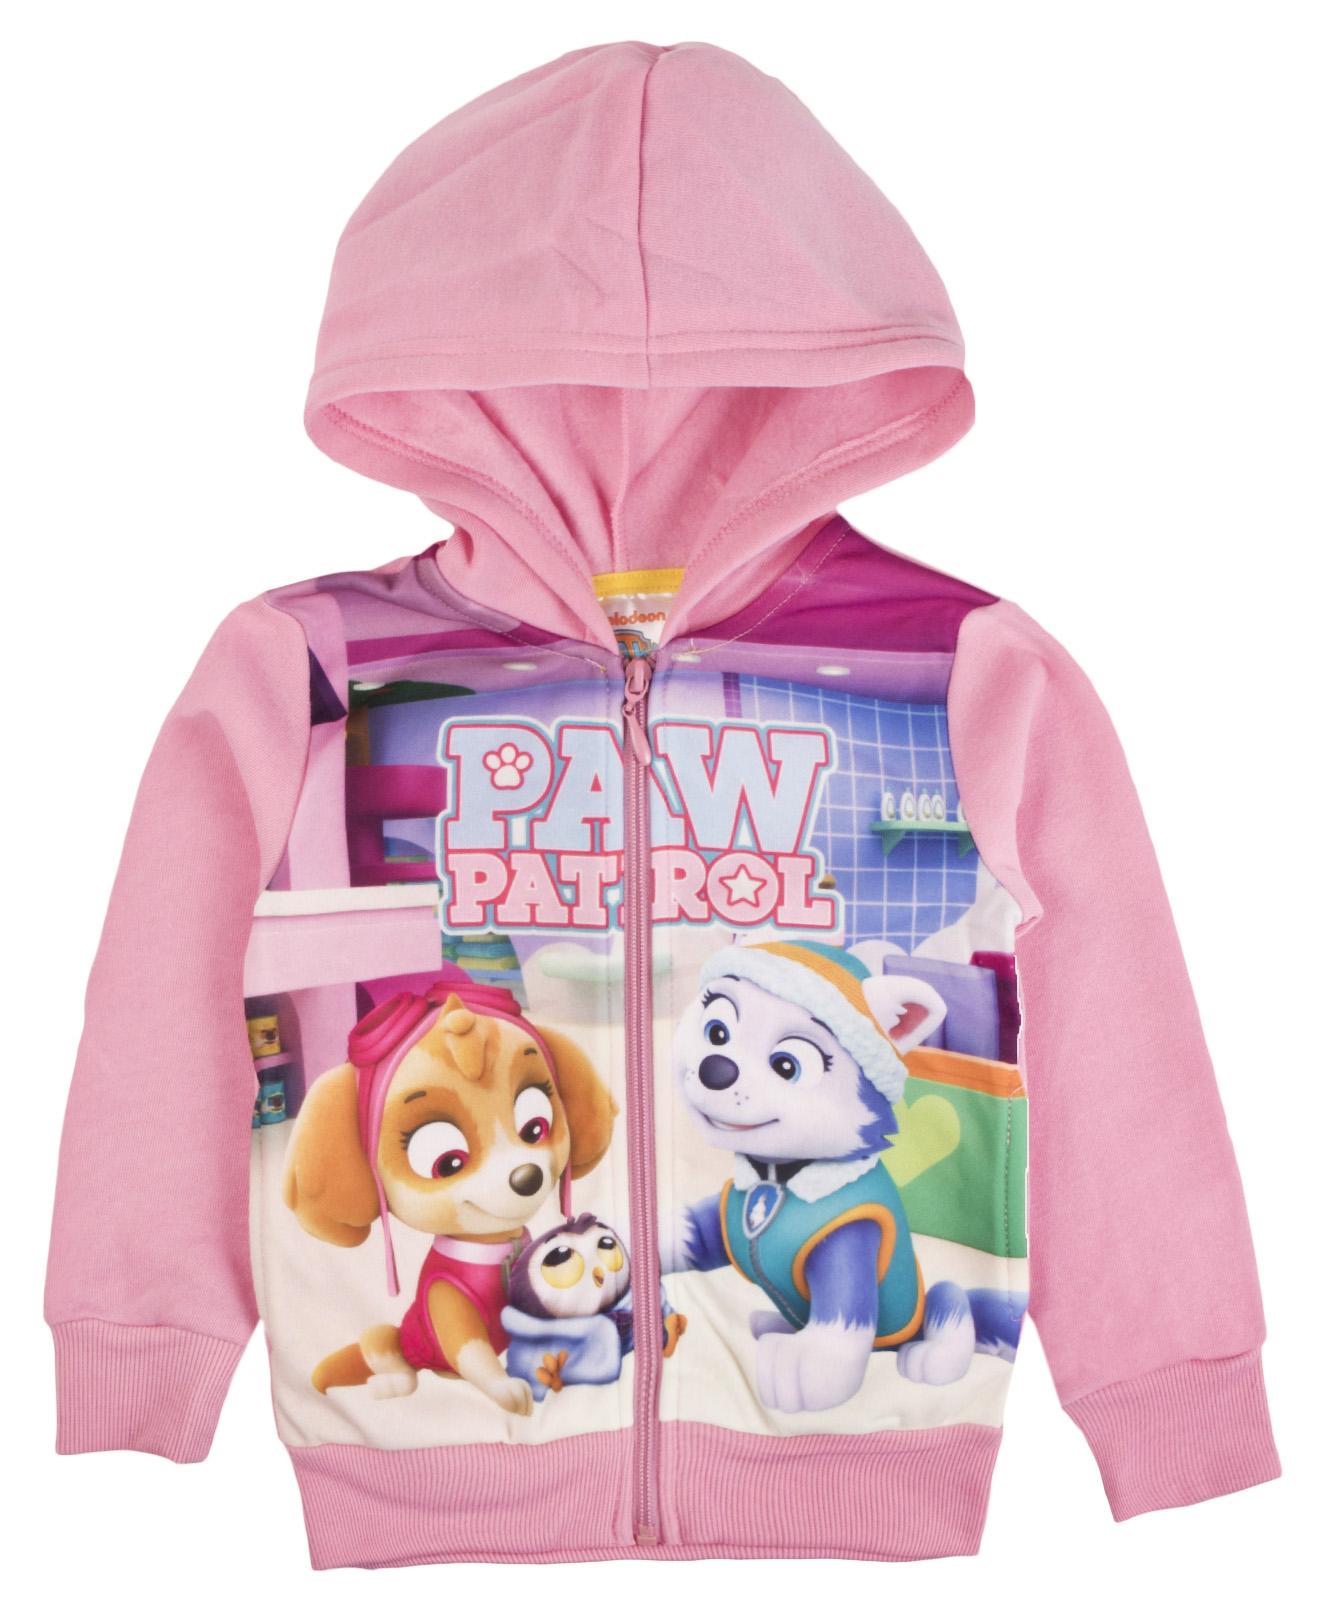 Paw-Patrol-filles-Zip-Hoody-filles-Skye-Everest-Nouveaute-Veste-Polaire-Pull-Taille